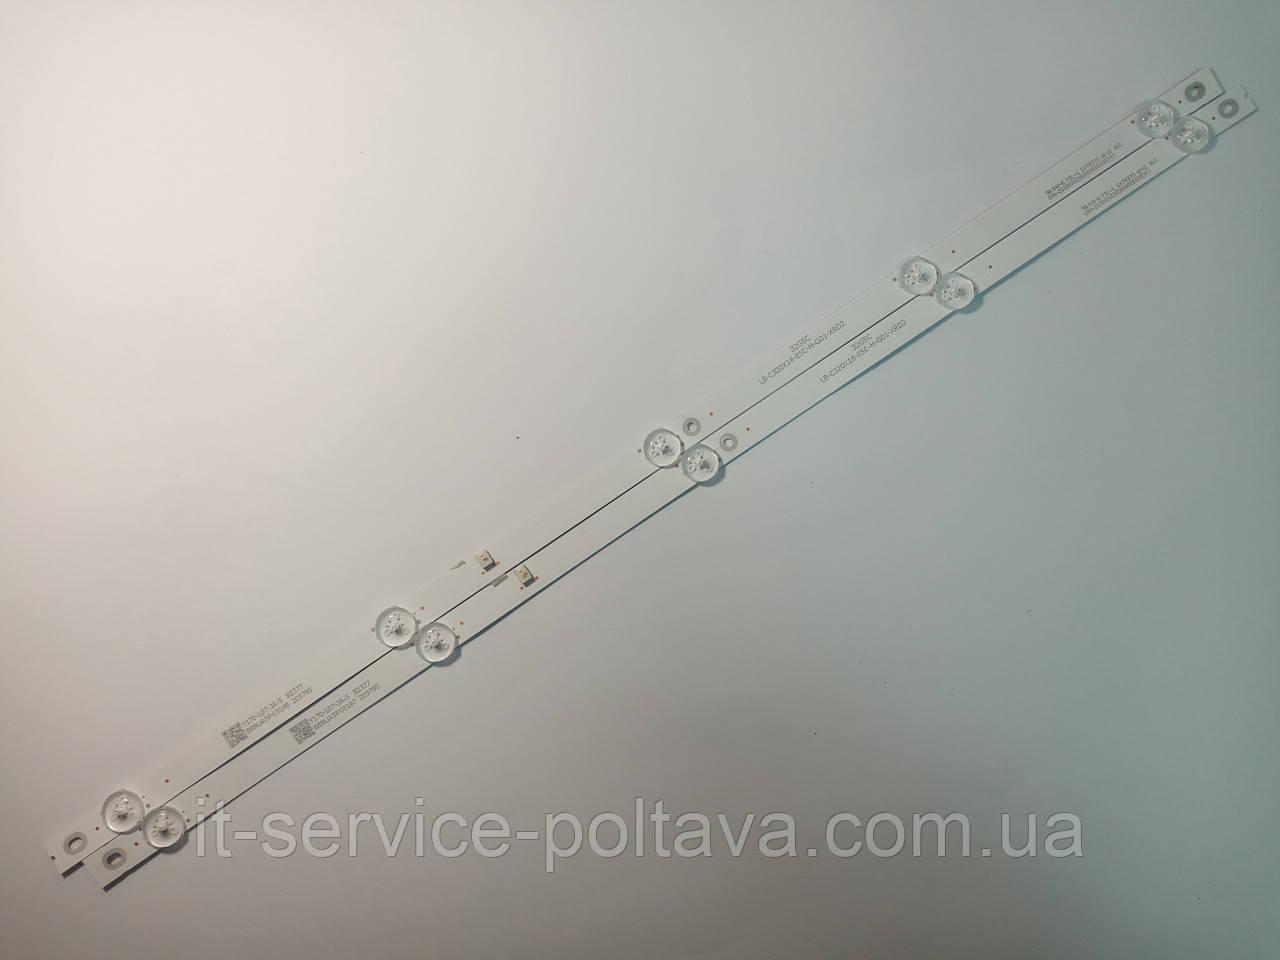 LED підсвітка 32G5C LB-C320X18-E5C-H-G01-XRD2